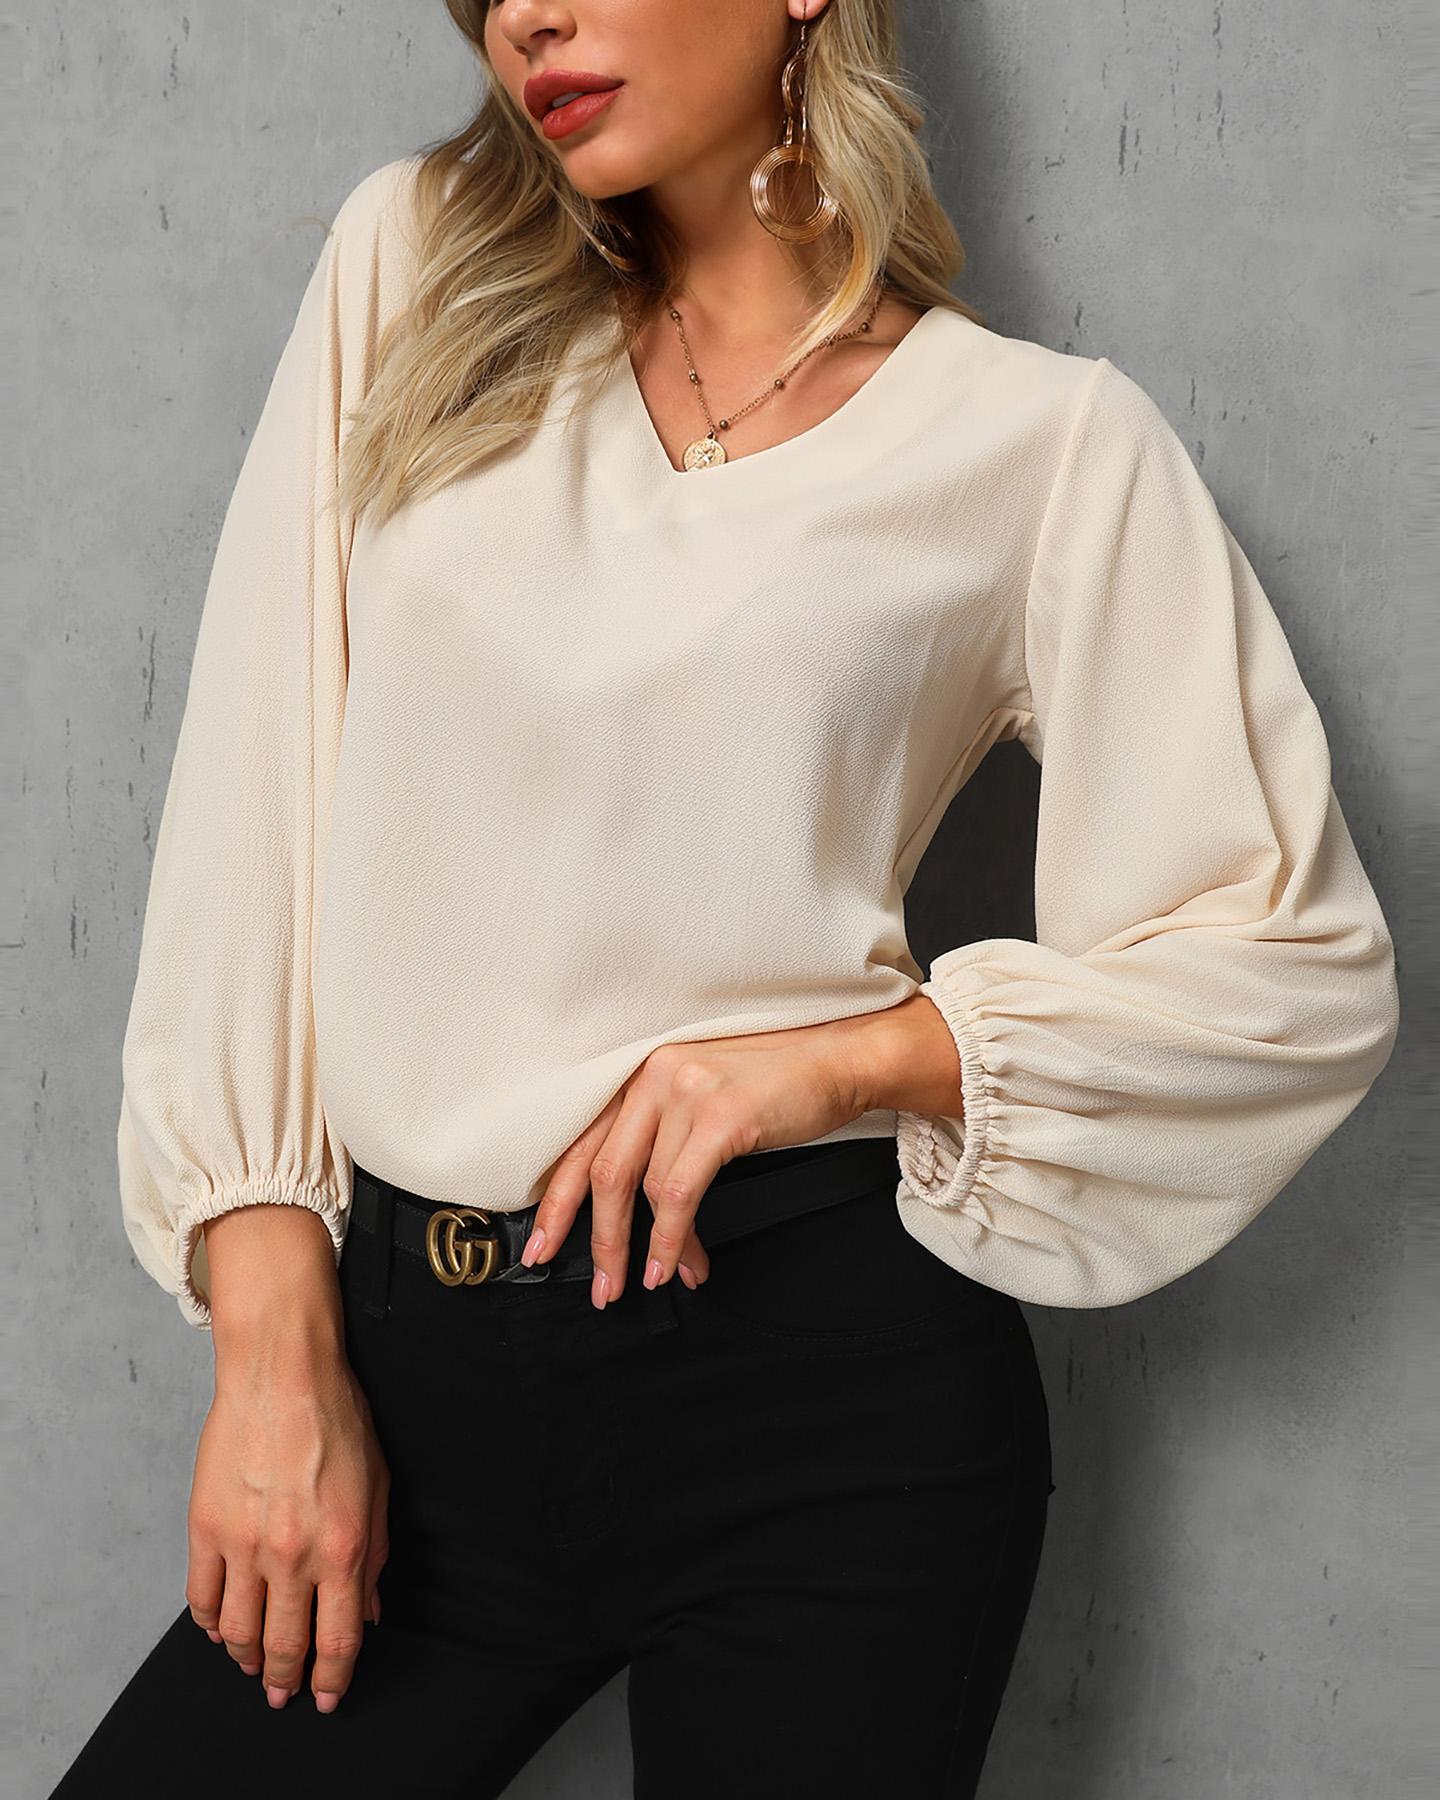 boutiquefeel / Blusa suelta de manga larga con cuello en V